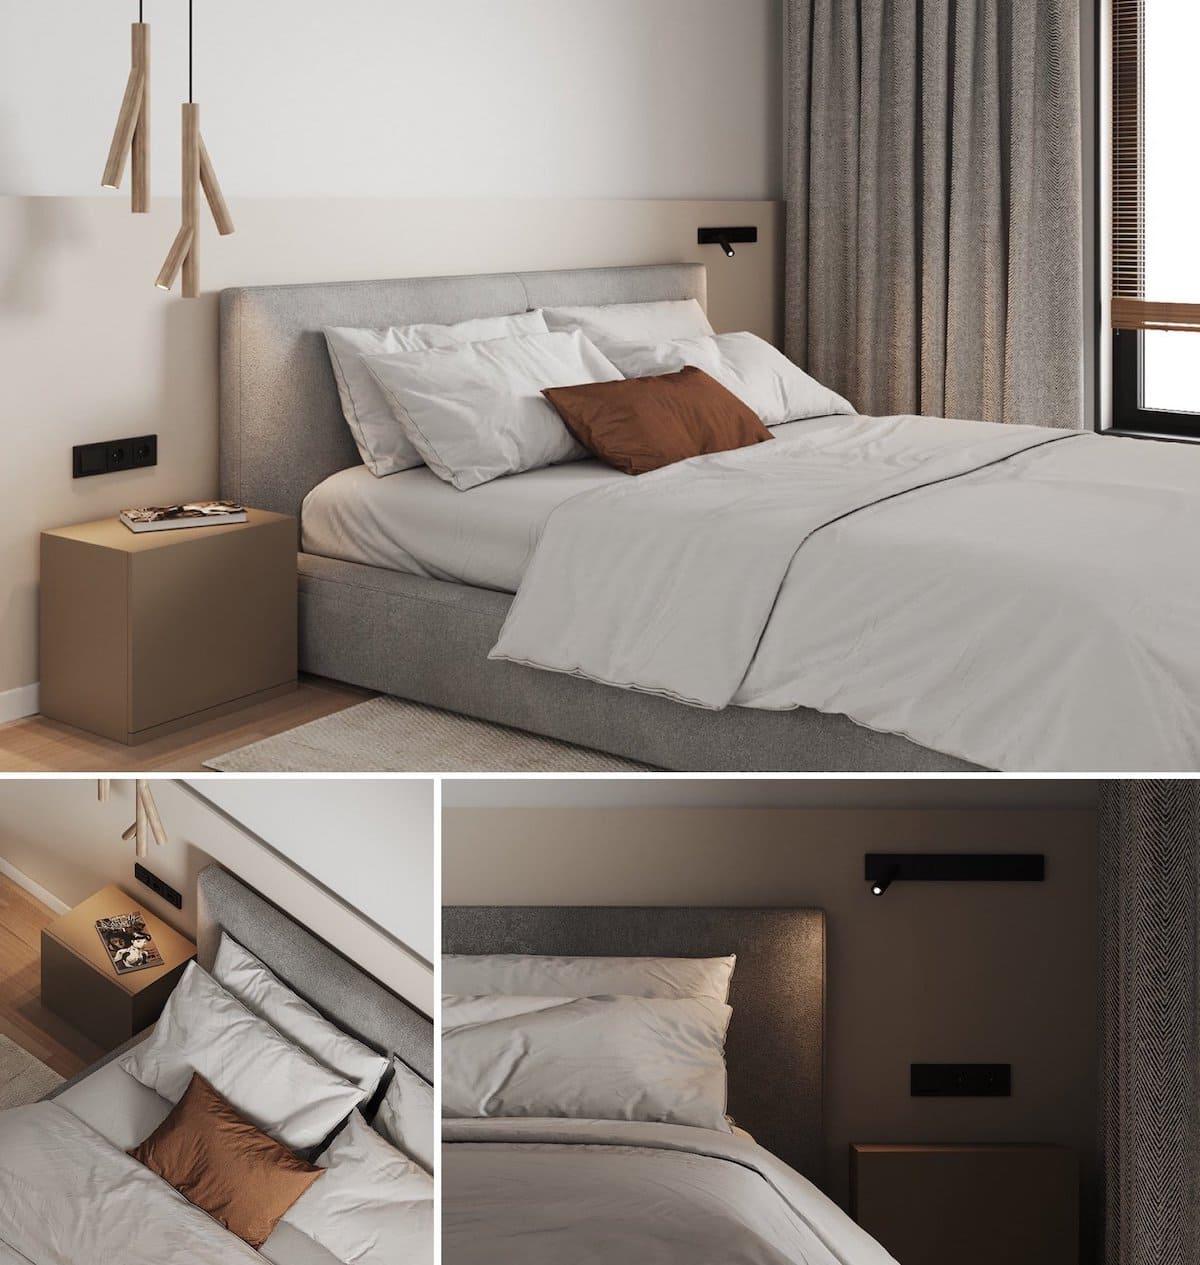 модный дизайн интерьера квартиры фото 94